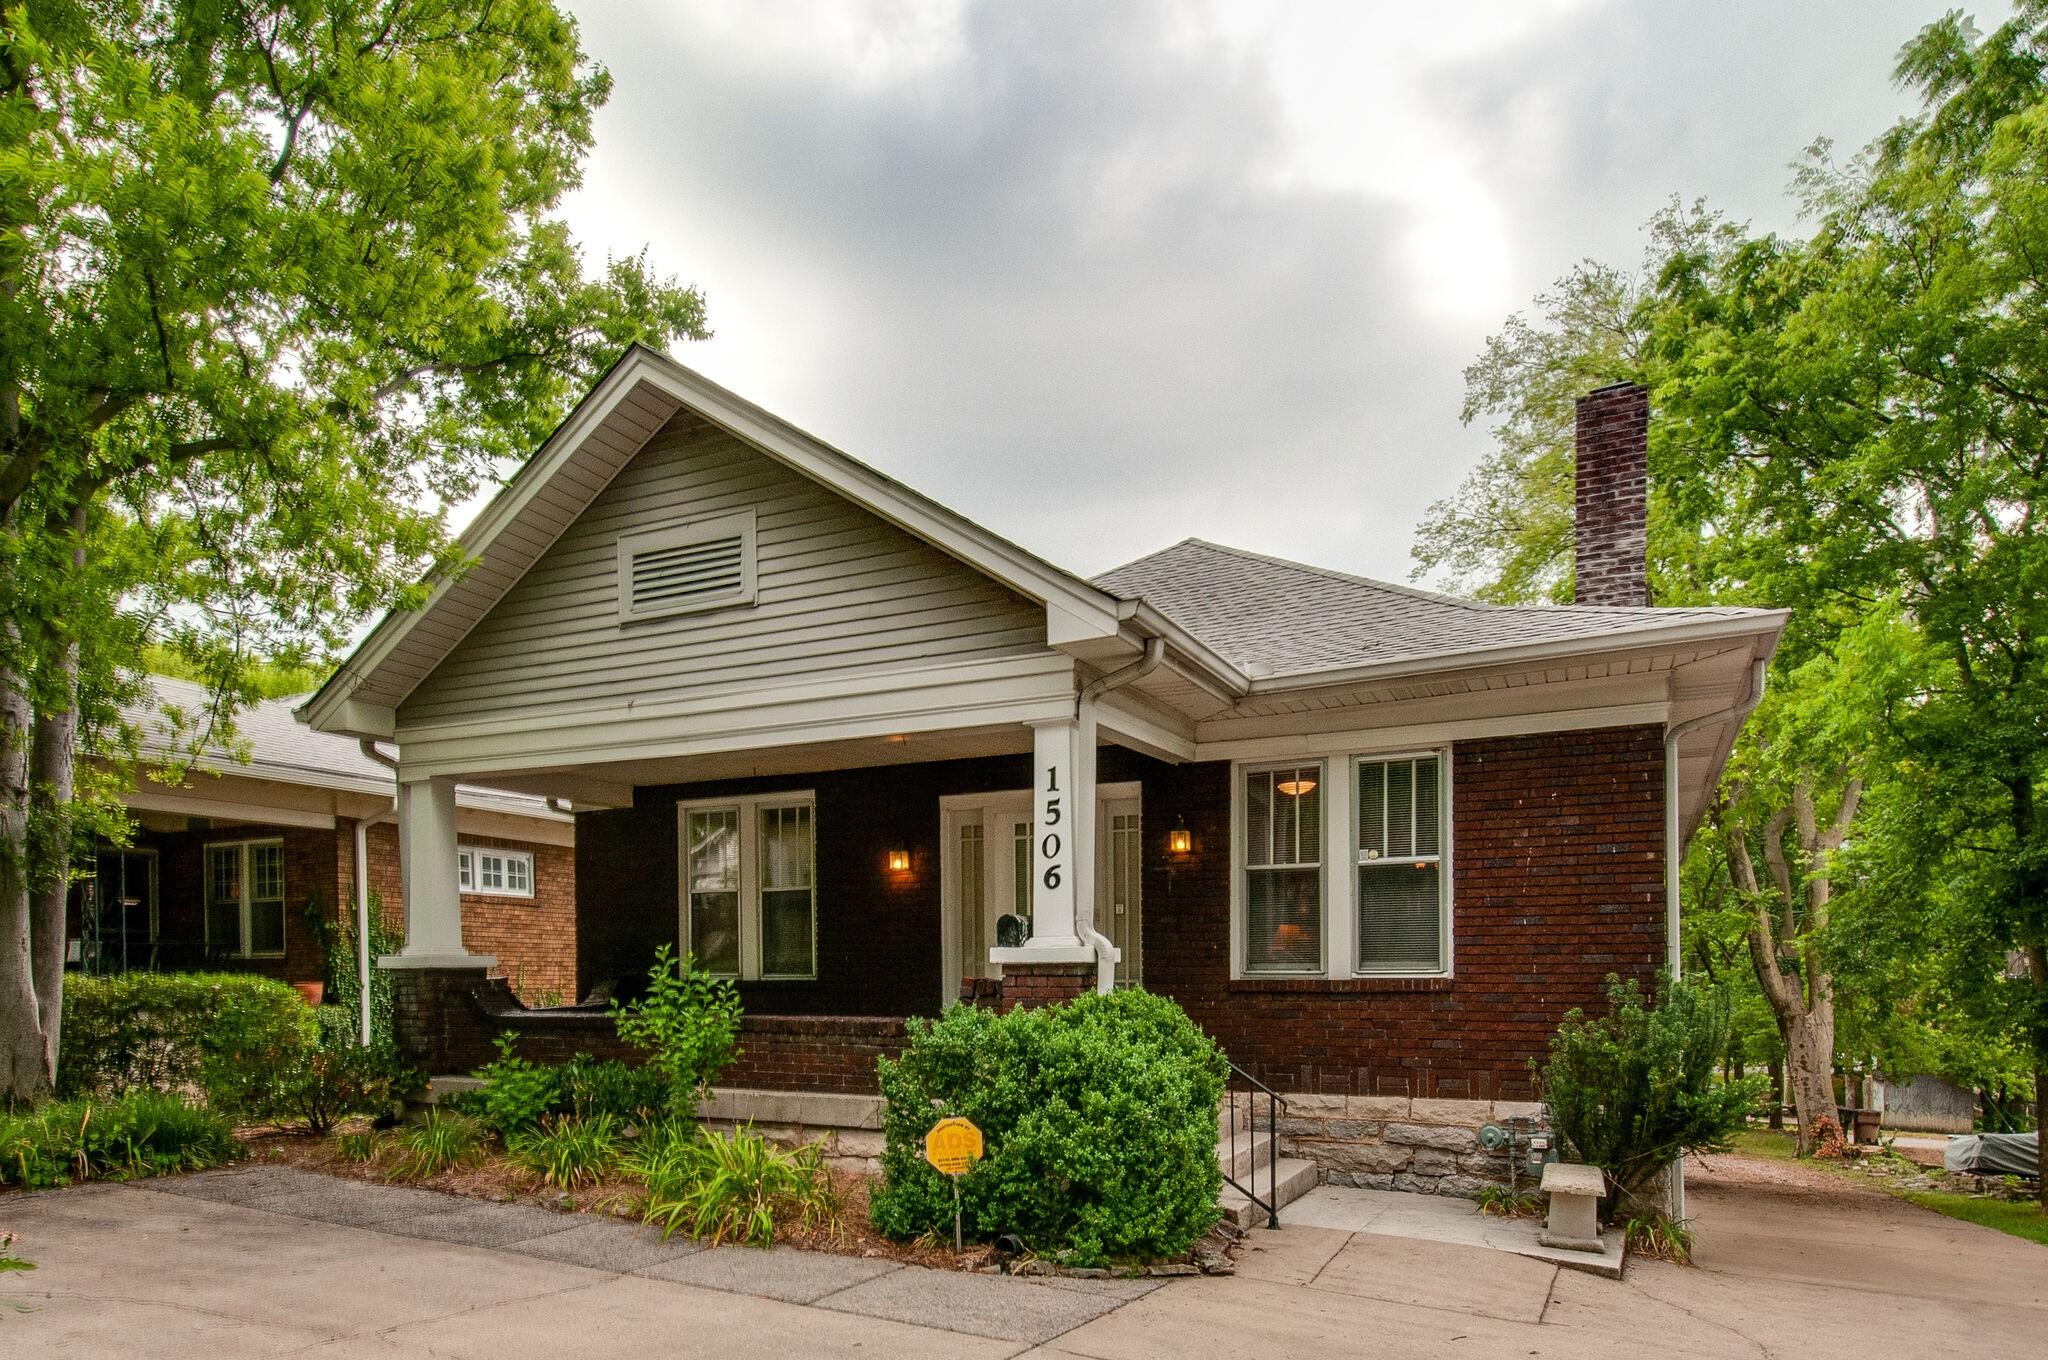 1506 17th Ave, S Property Photo - Nashville, TN real estate listing